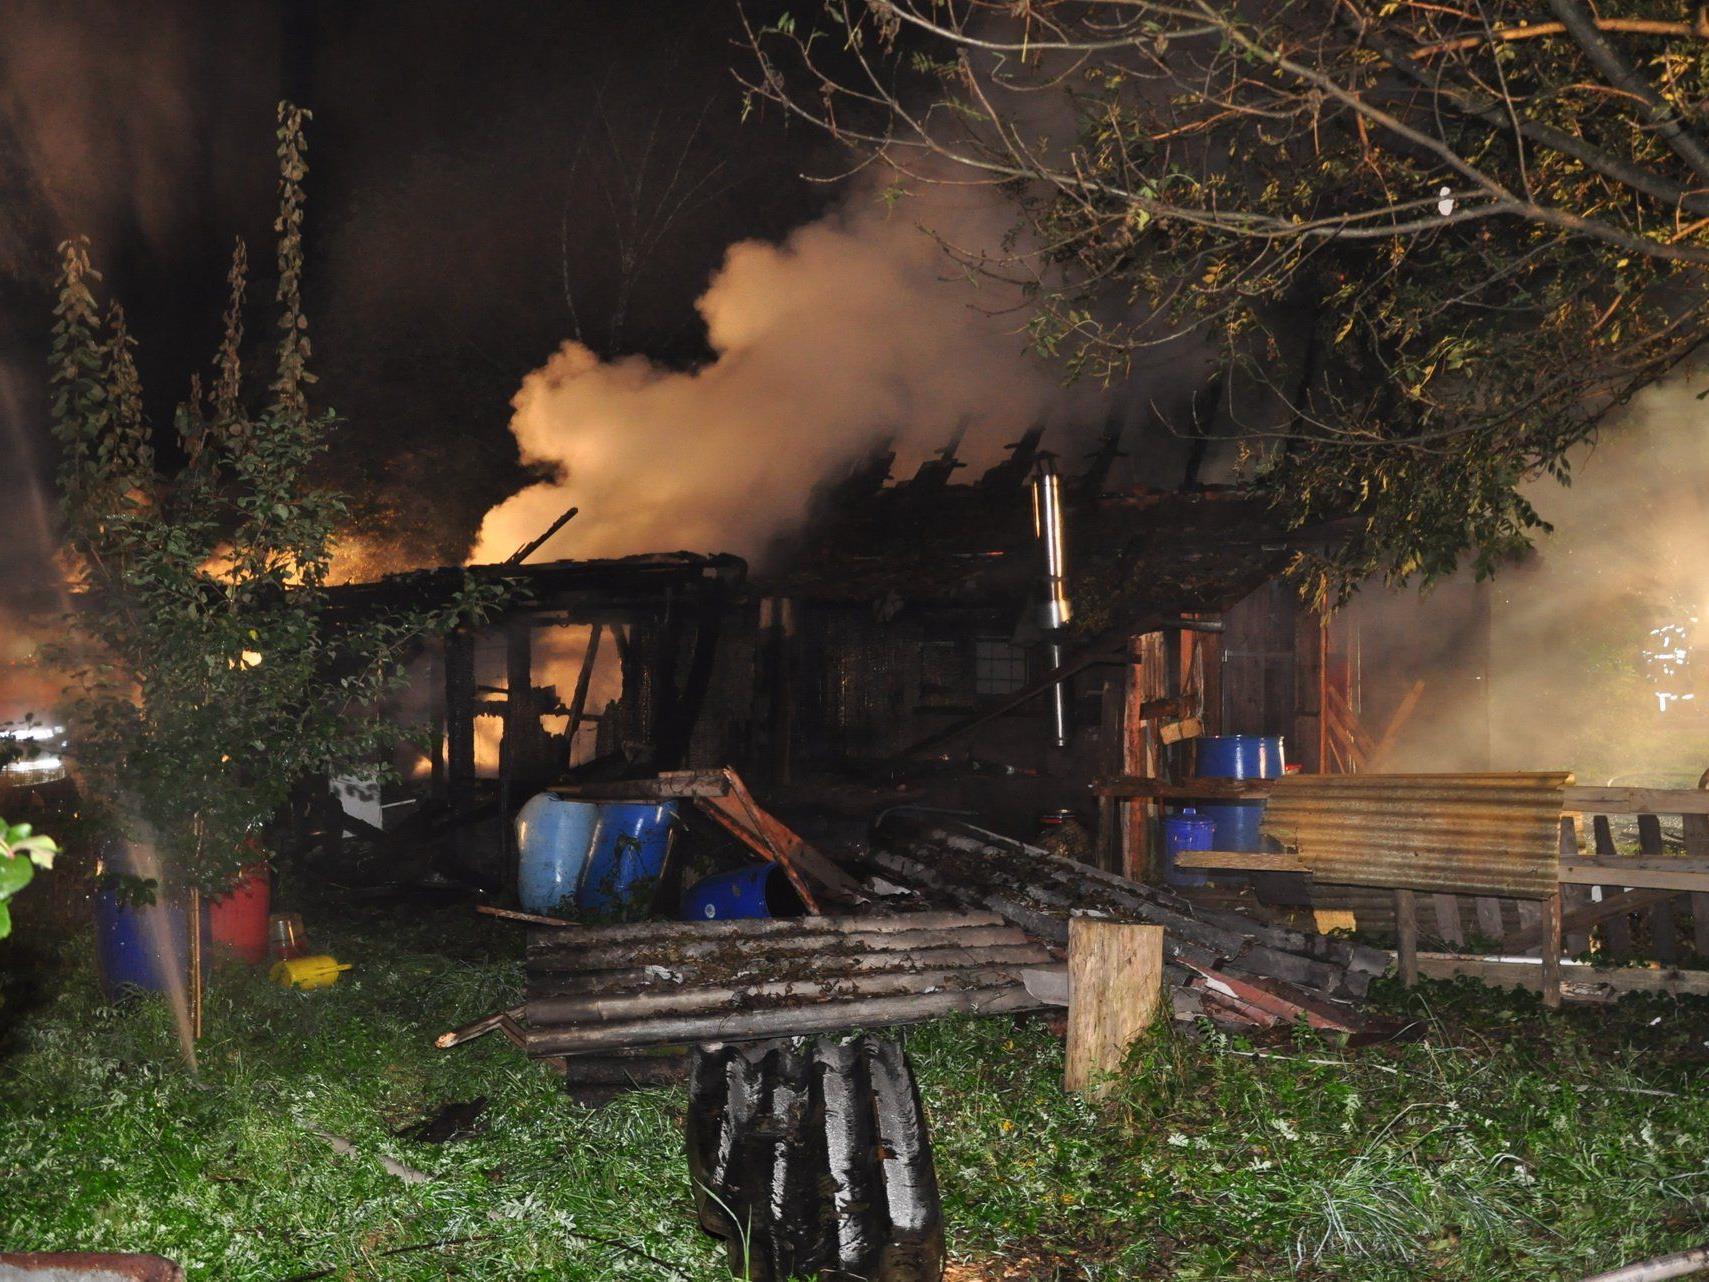 Hohenemser Riedhütte bei Brand komplett zerstört.